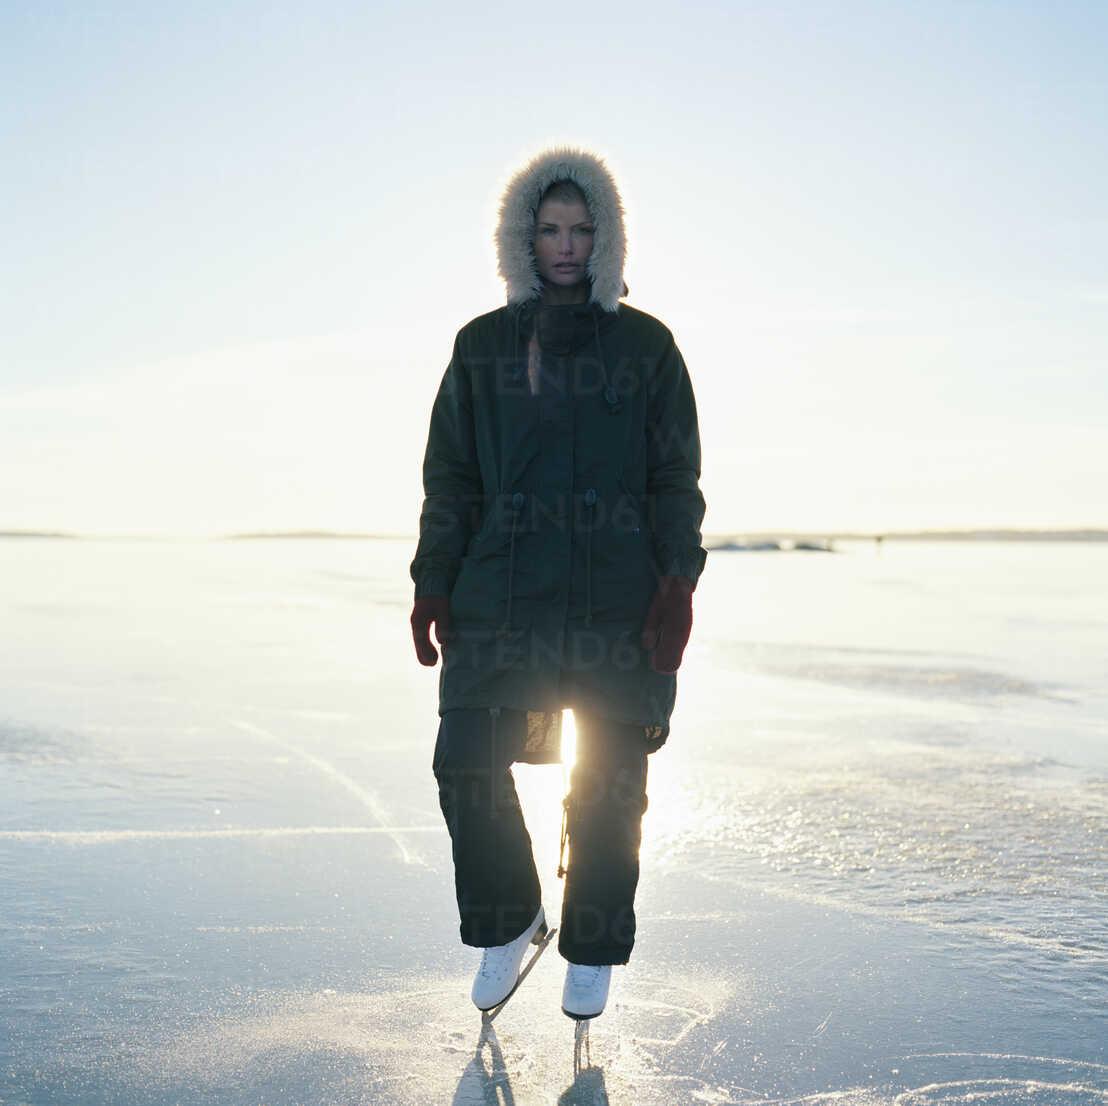 Mid adult woman in ice skates standing on frozen lake - FOLF00801 - Johan Mård/Westend61